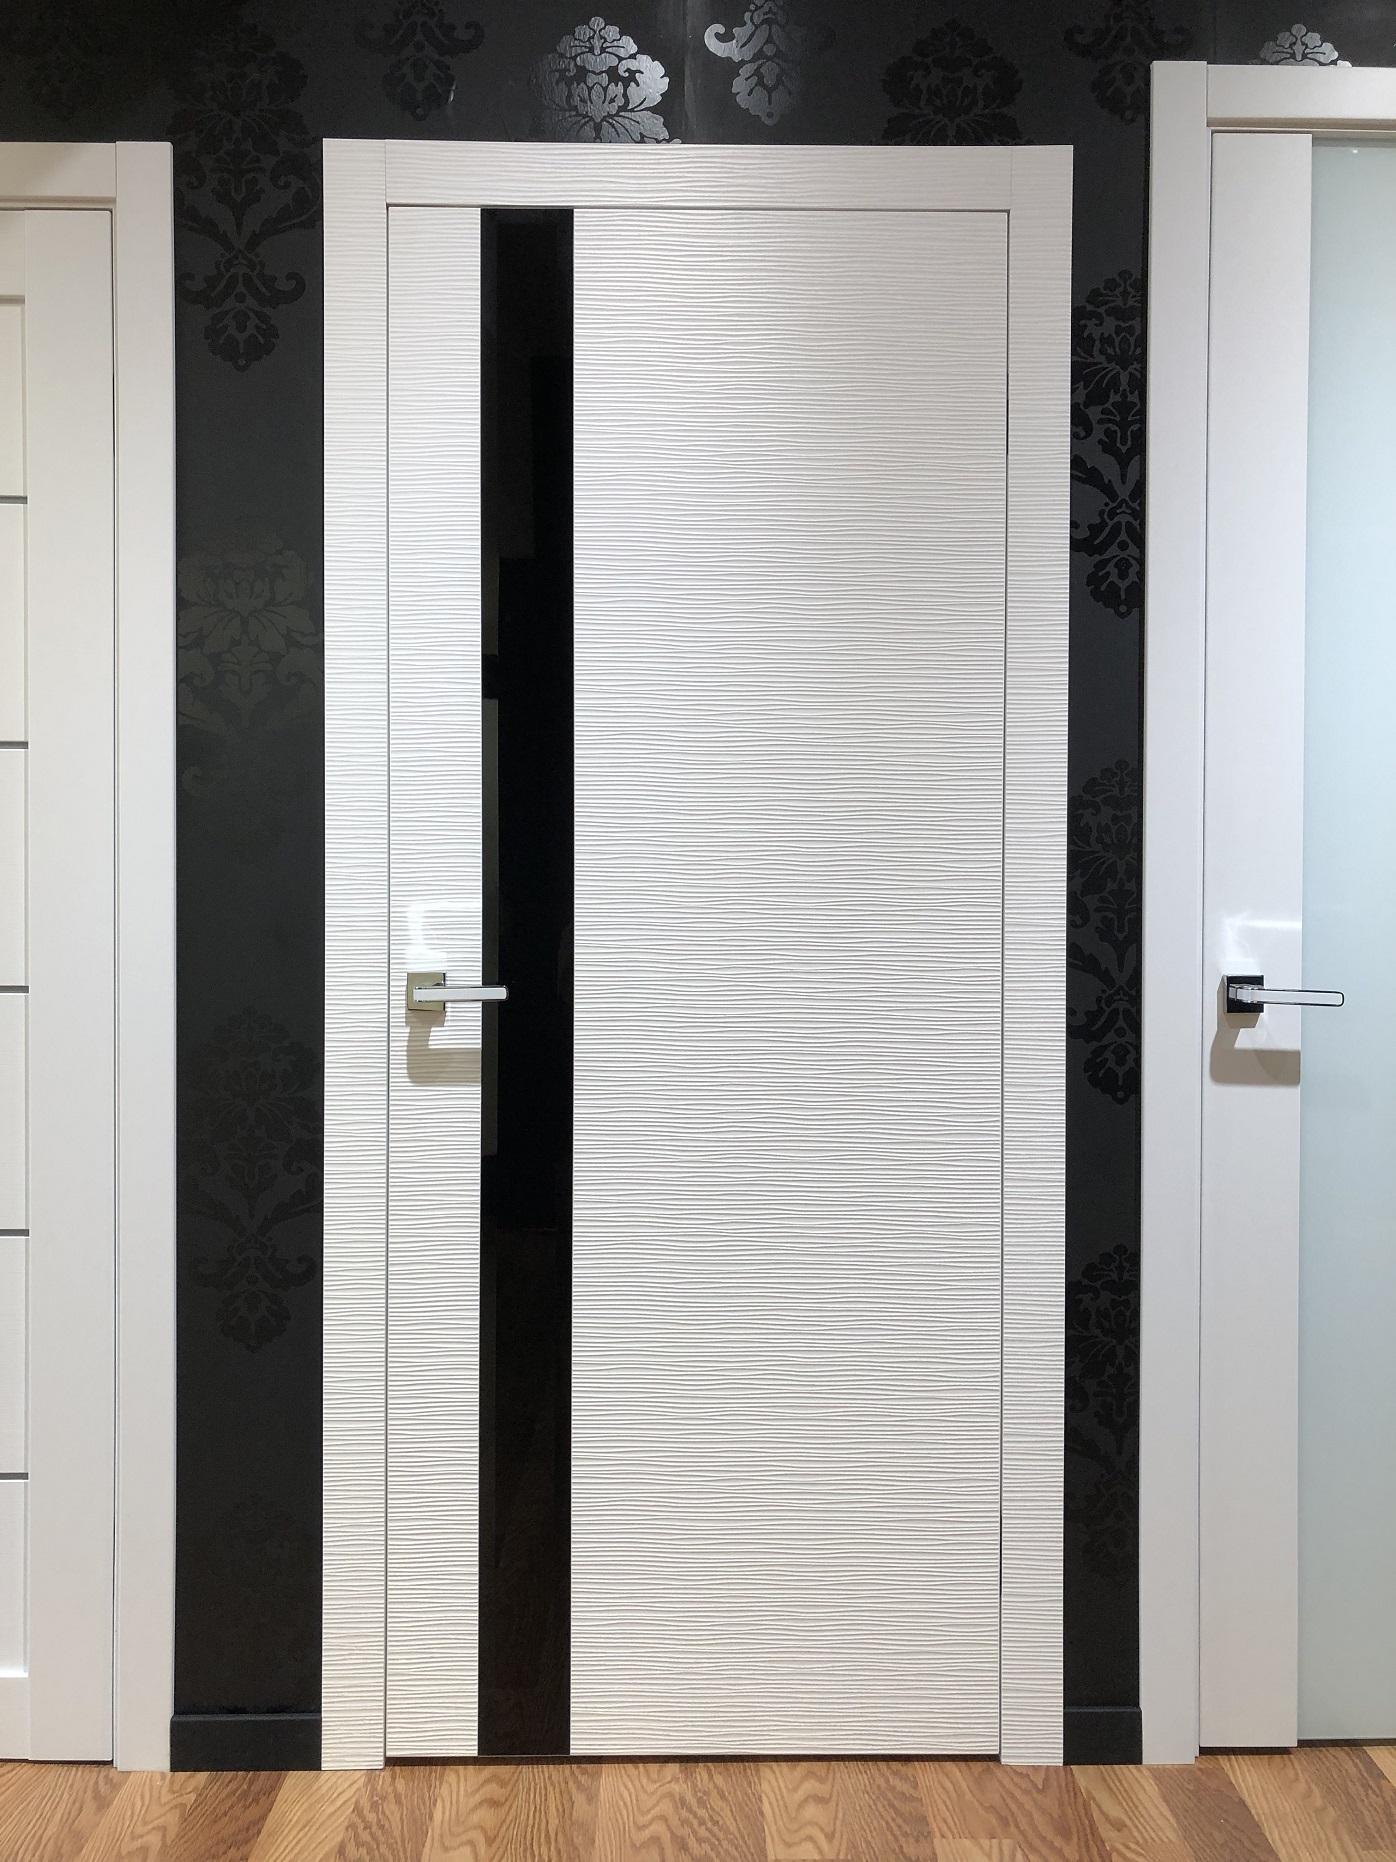 Dianto Interior Door 3d White Black Beveled Glass Indigo Doors